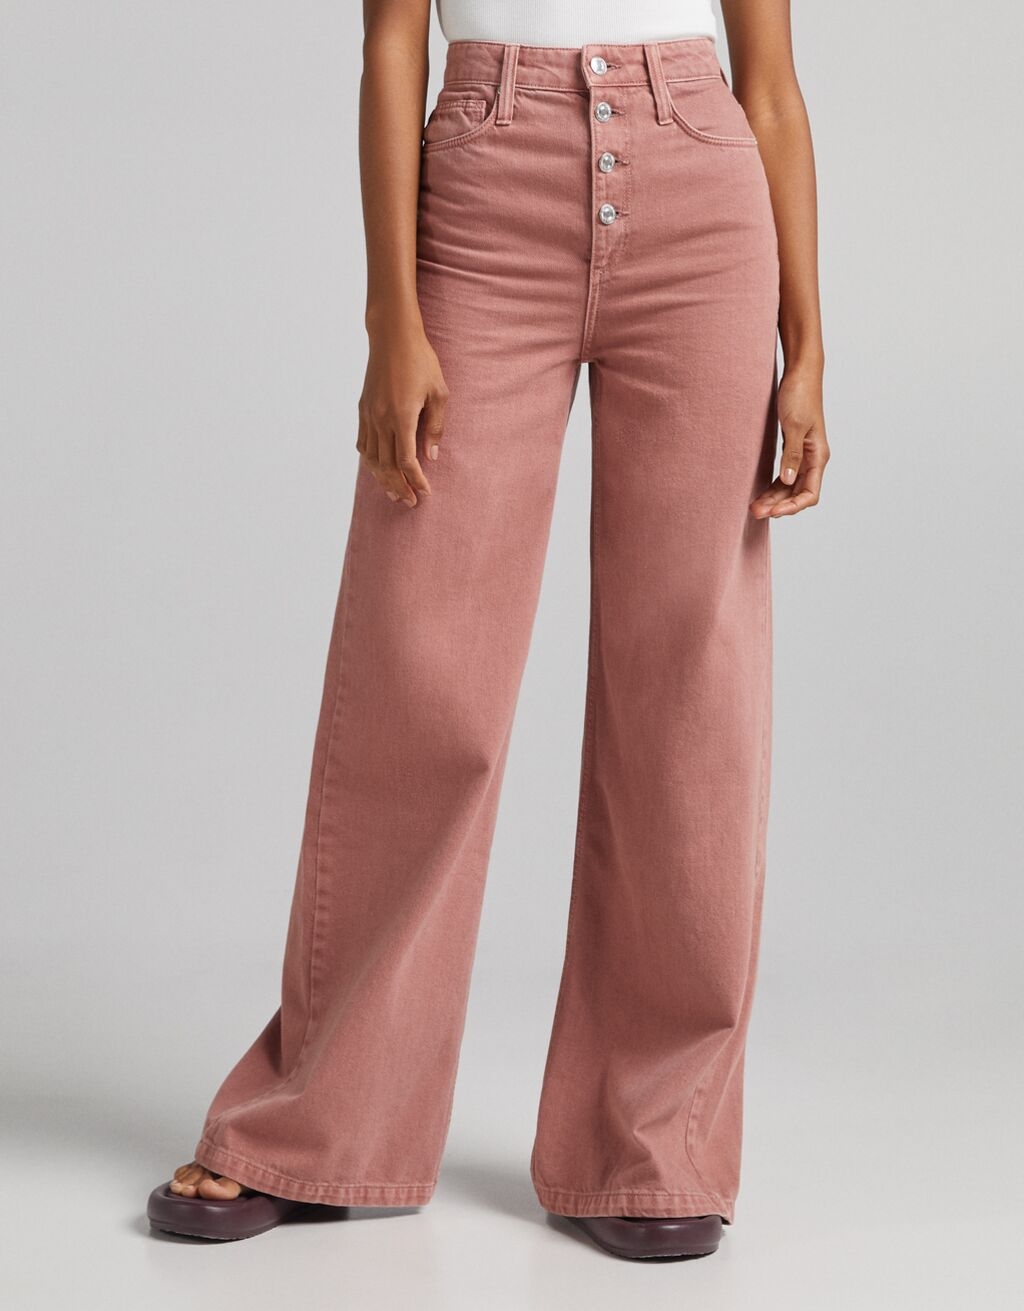 Pantalón sarga super wide leg